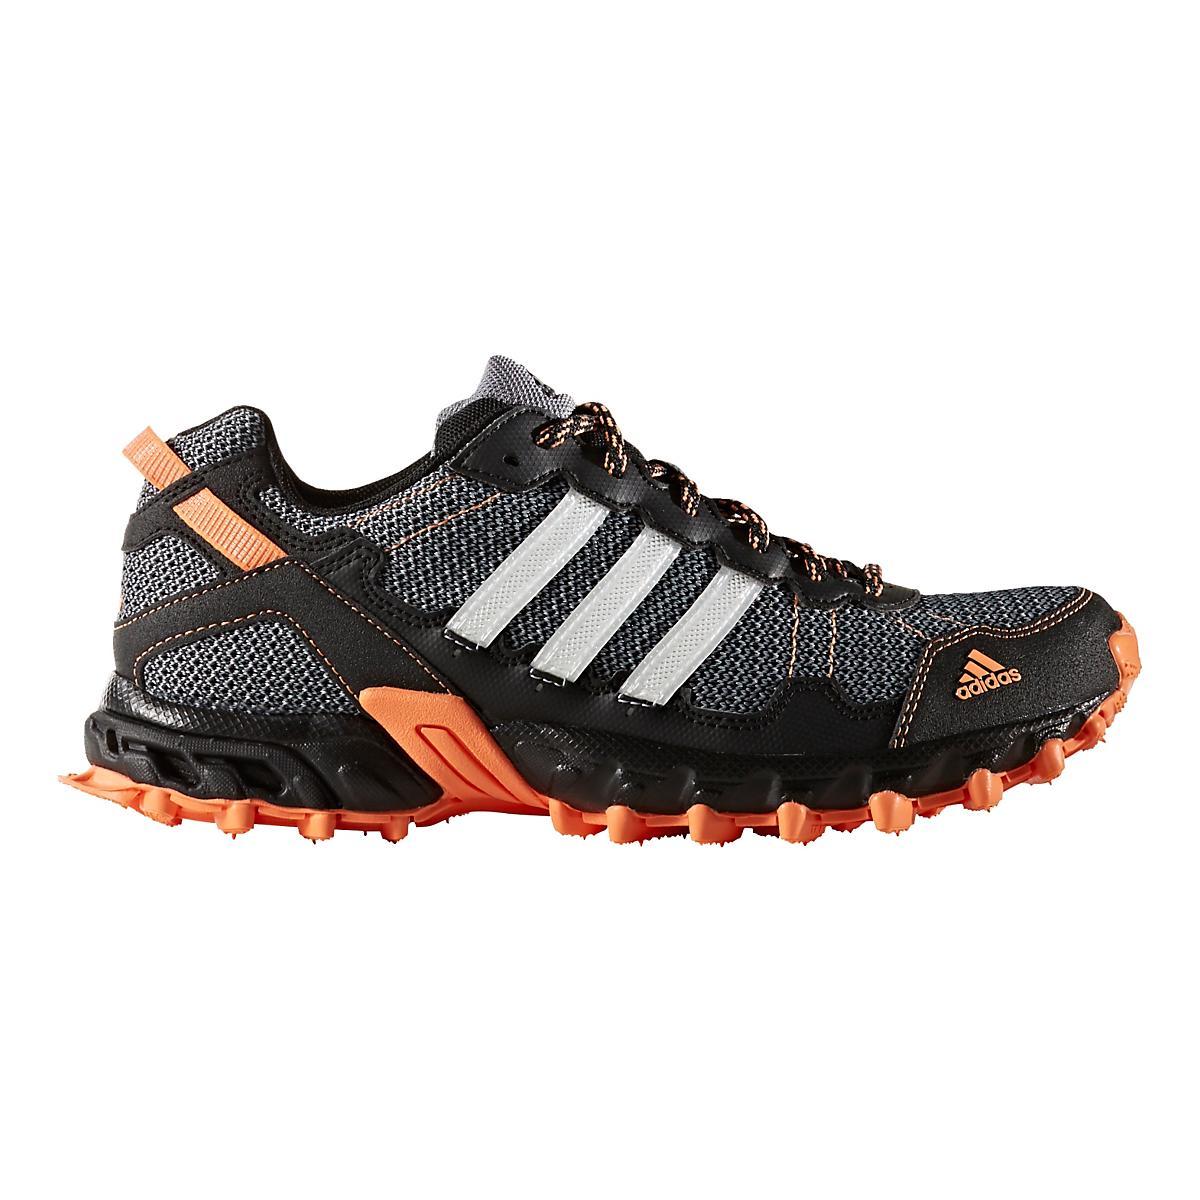 Womens adidas Rockadia Trail Running Shoe at Road Runner